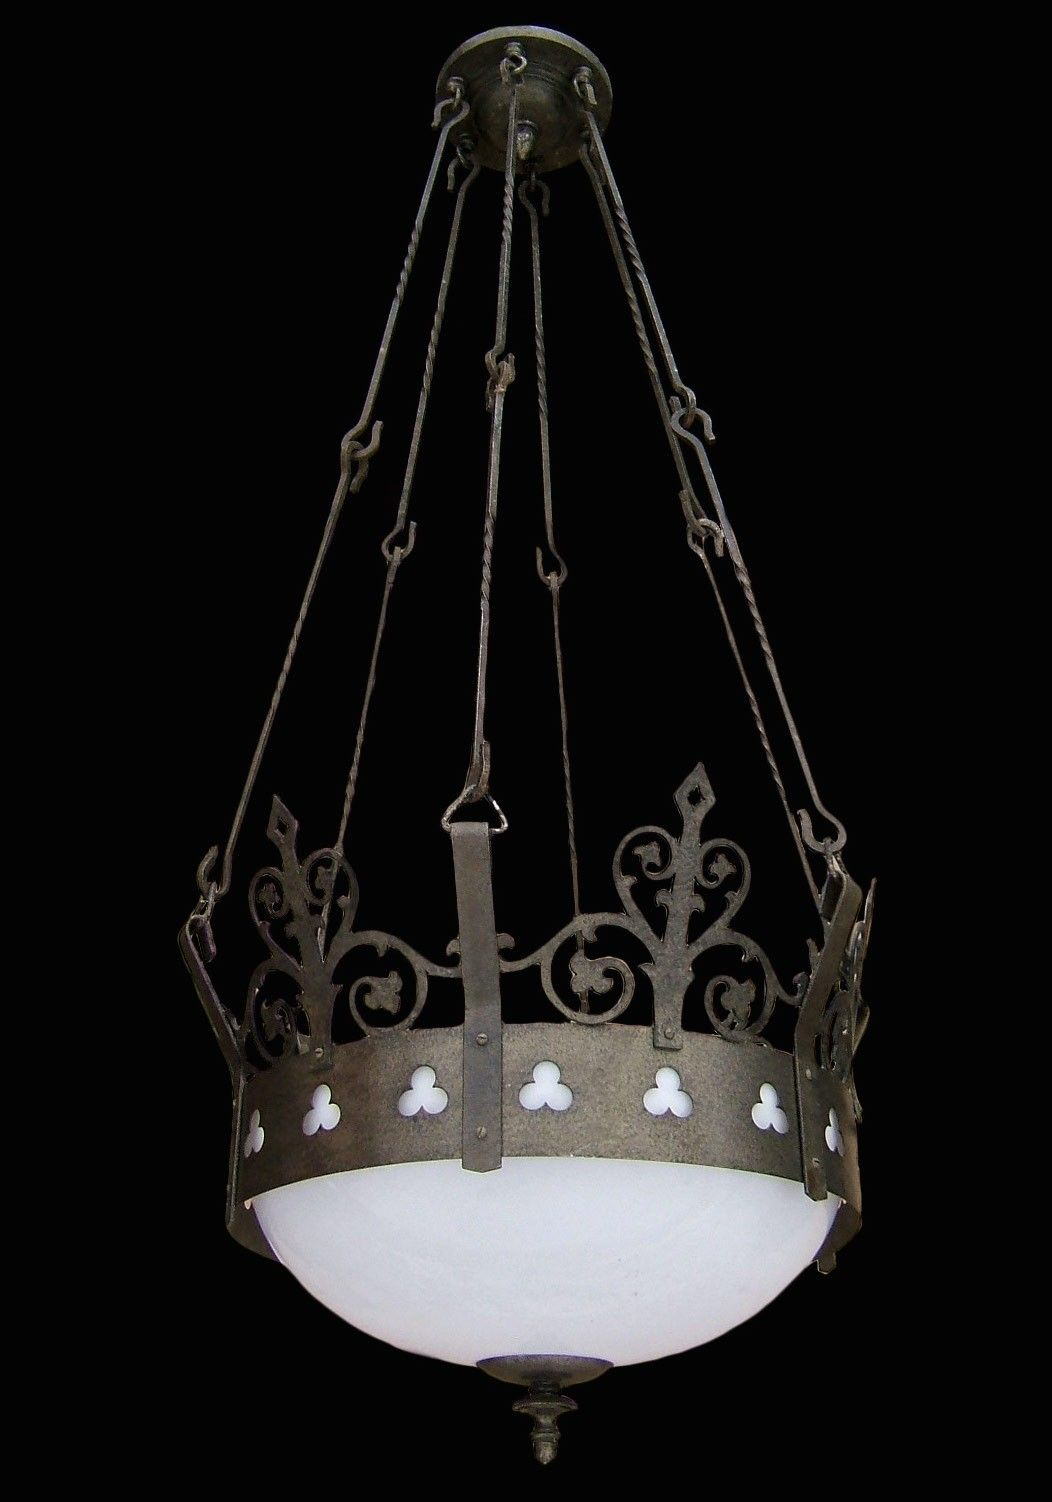 Antique Gothic Hanging Church Pendant Light Fixture Light